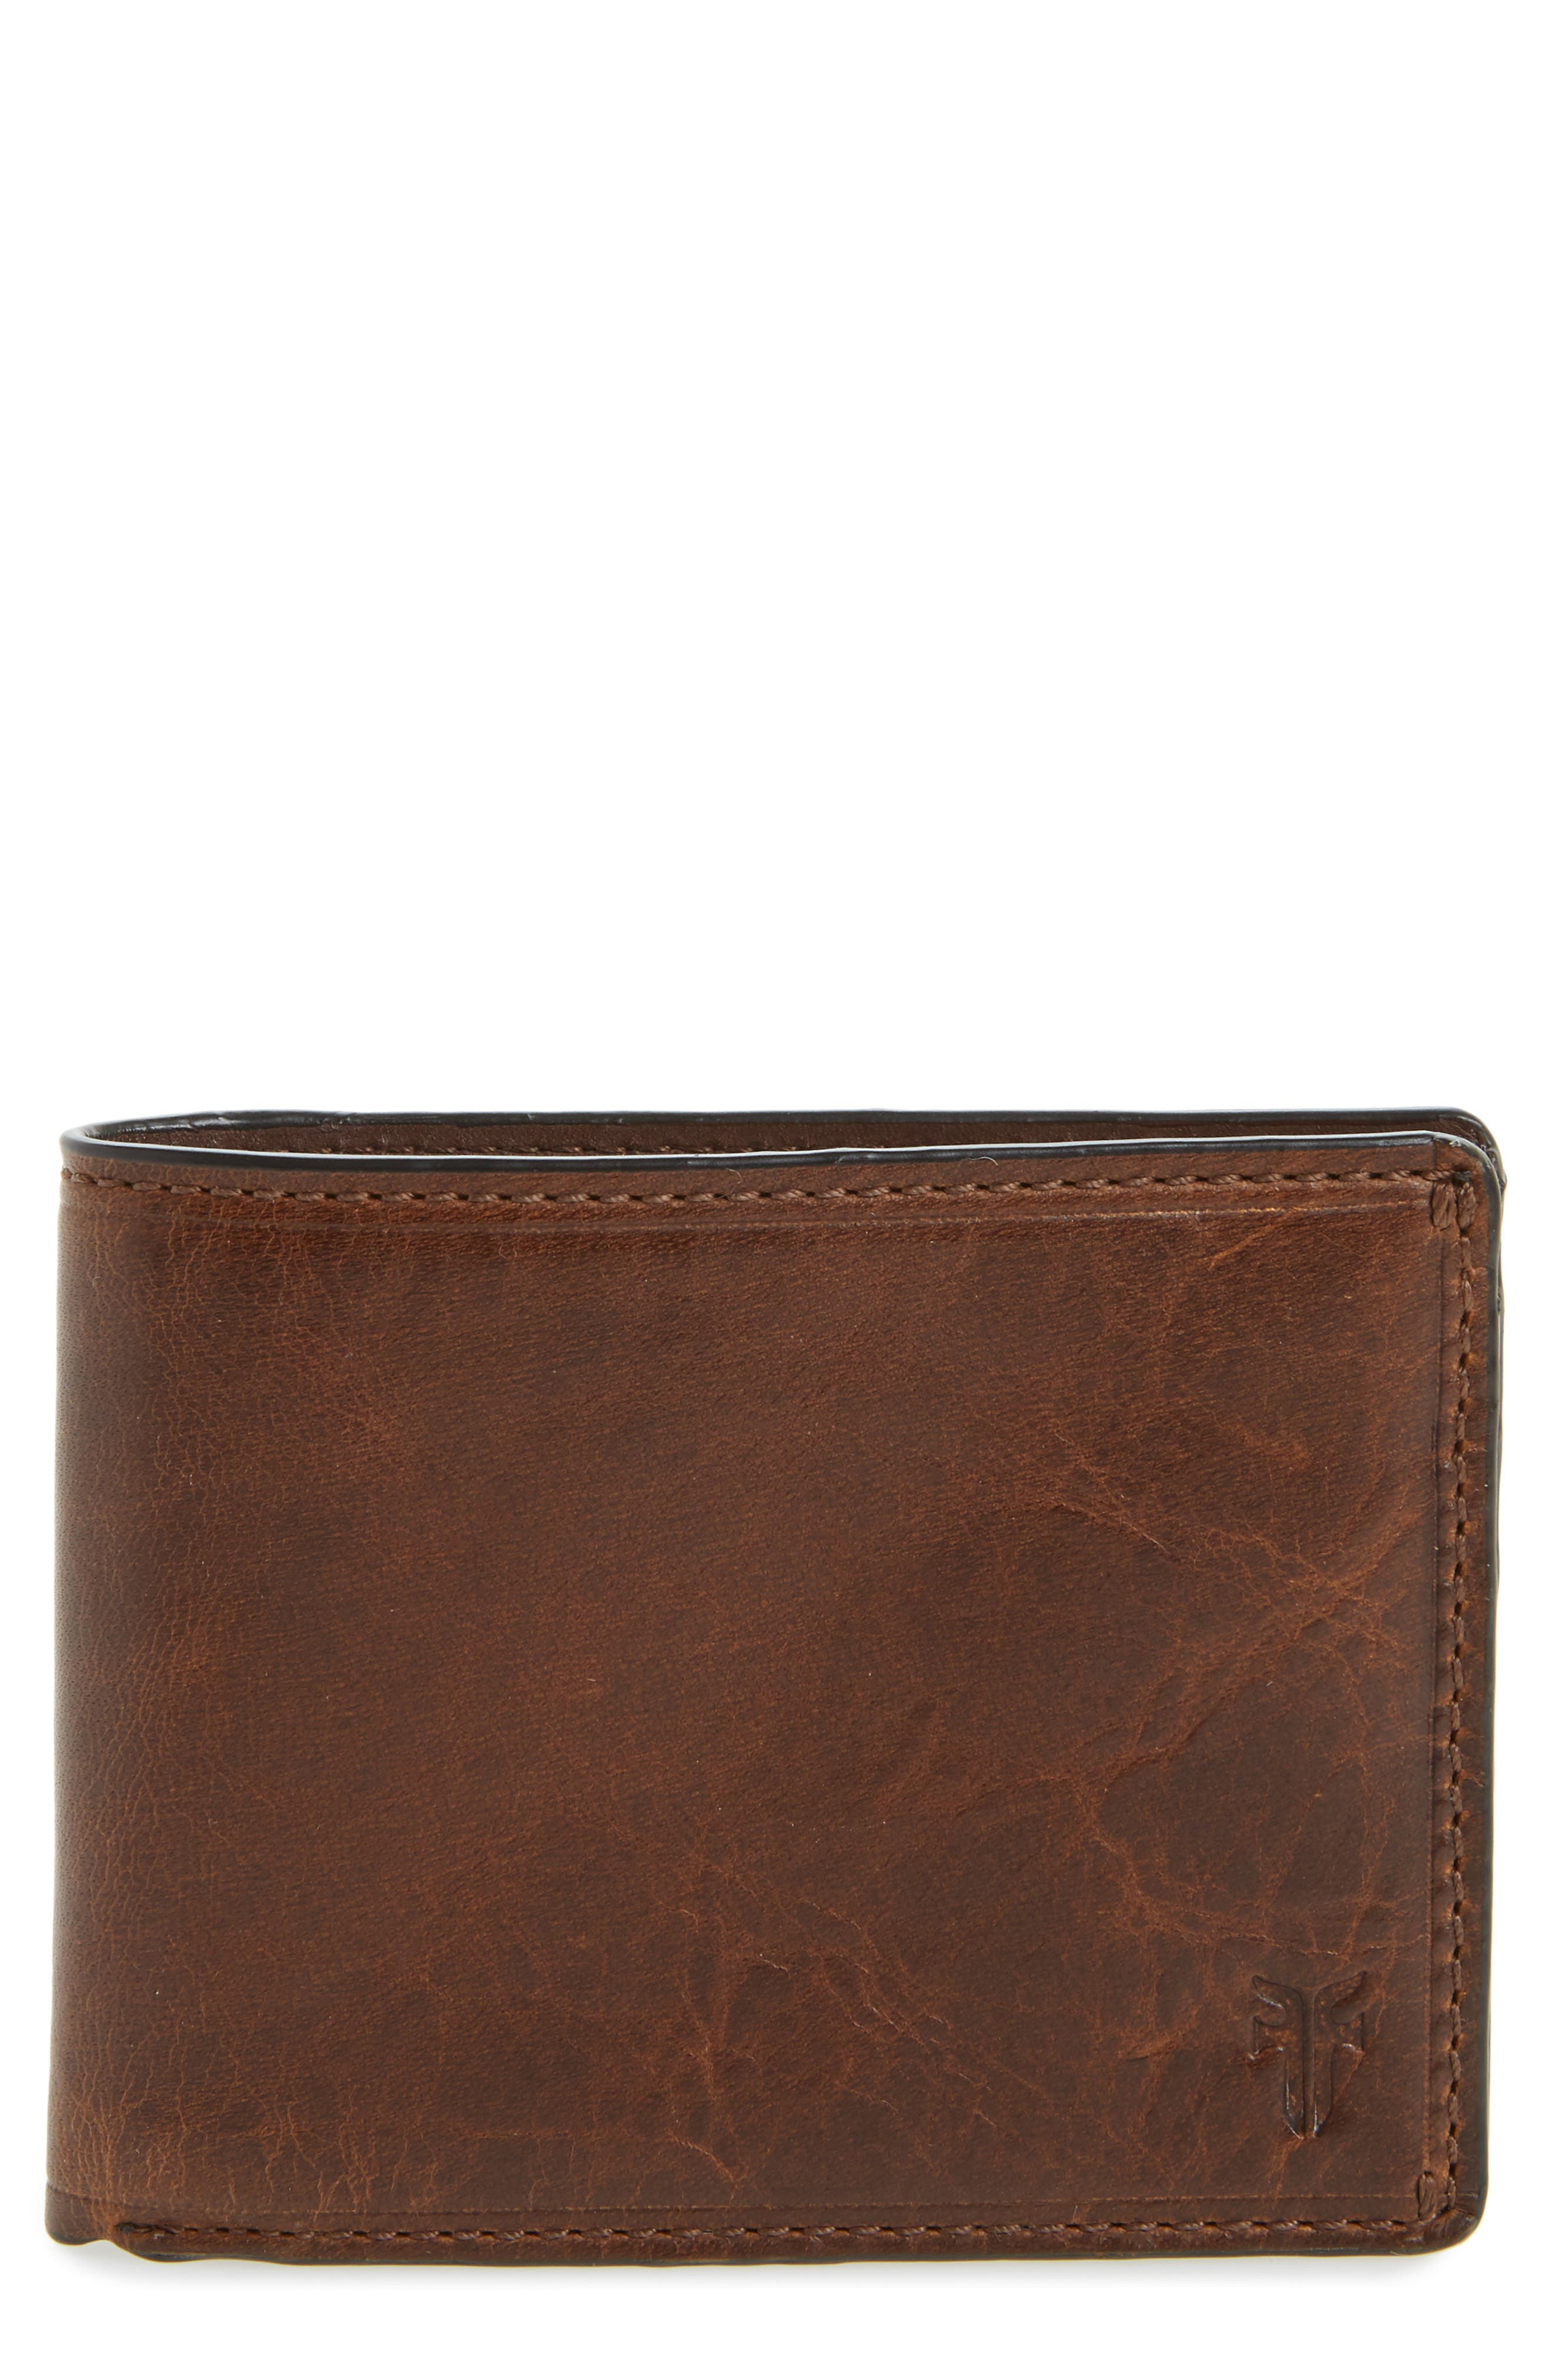 Logan Leather Wallet,                         Main,                         color, DARK BROWN